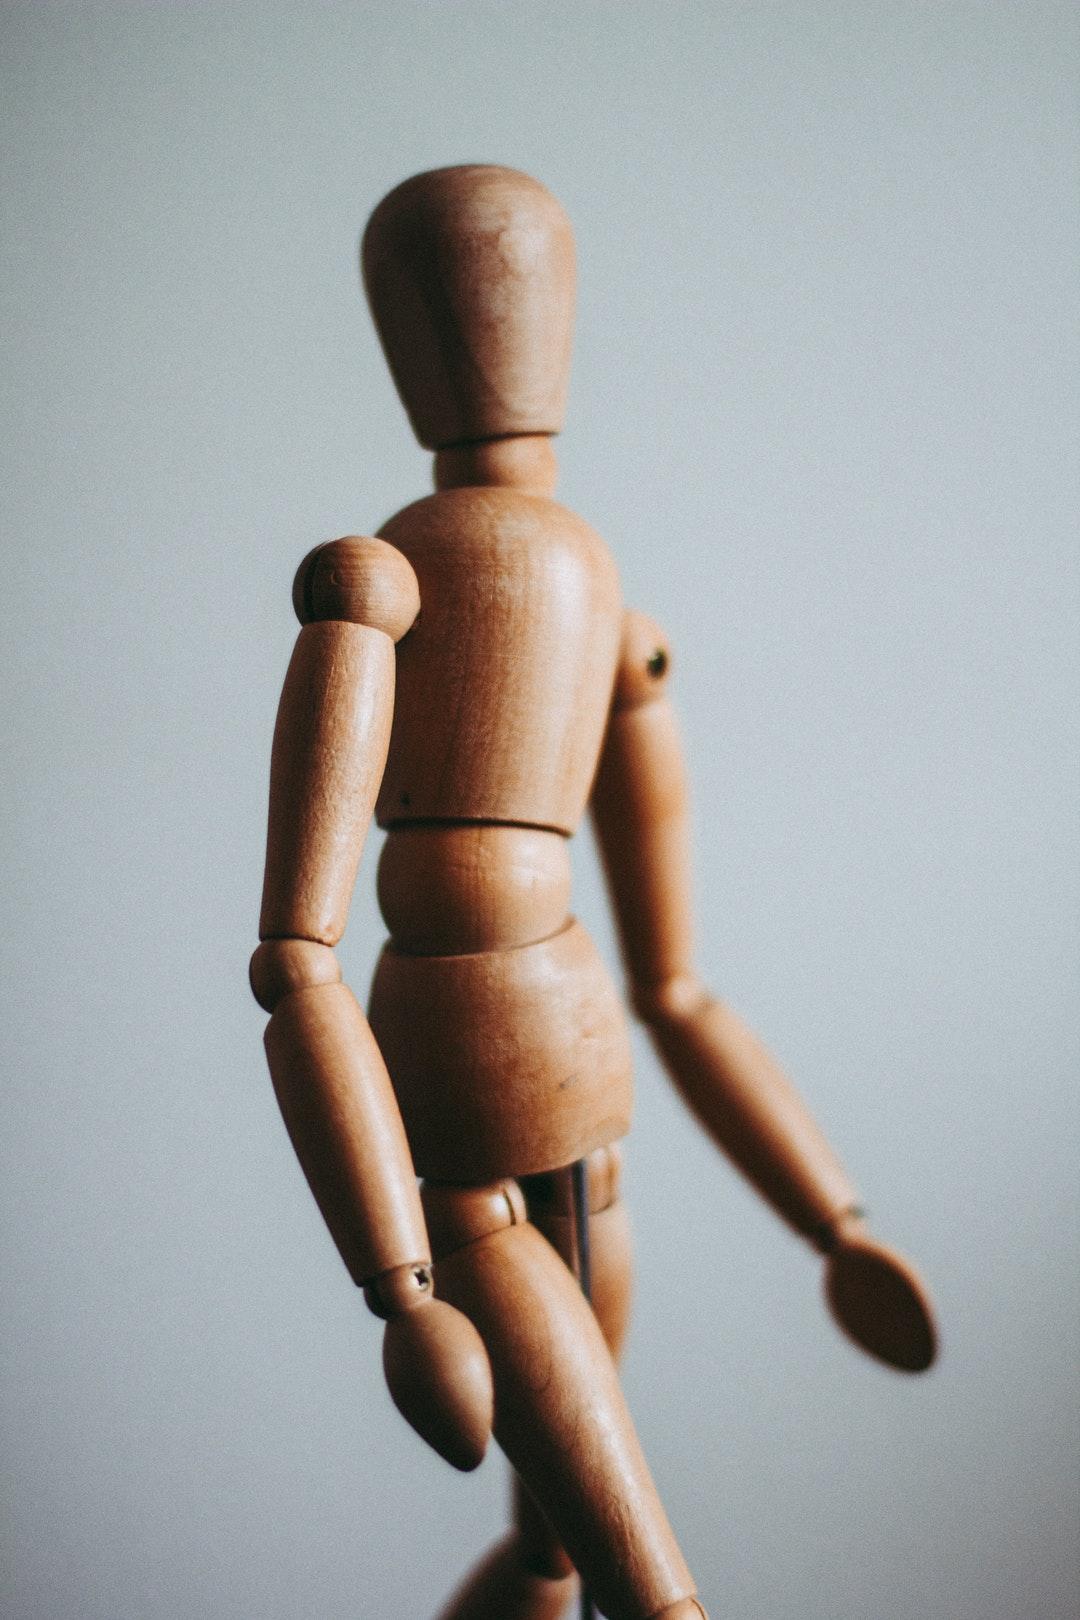 Wooden_man_figure